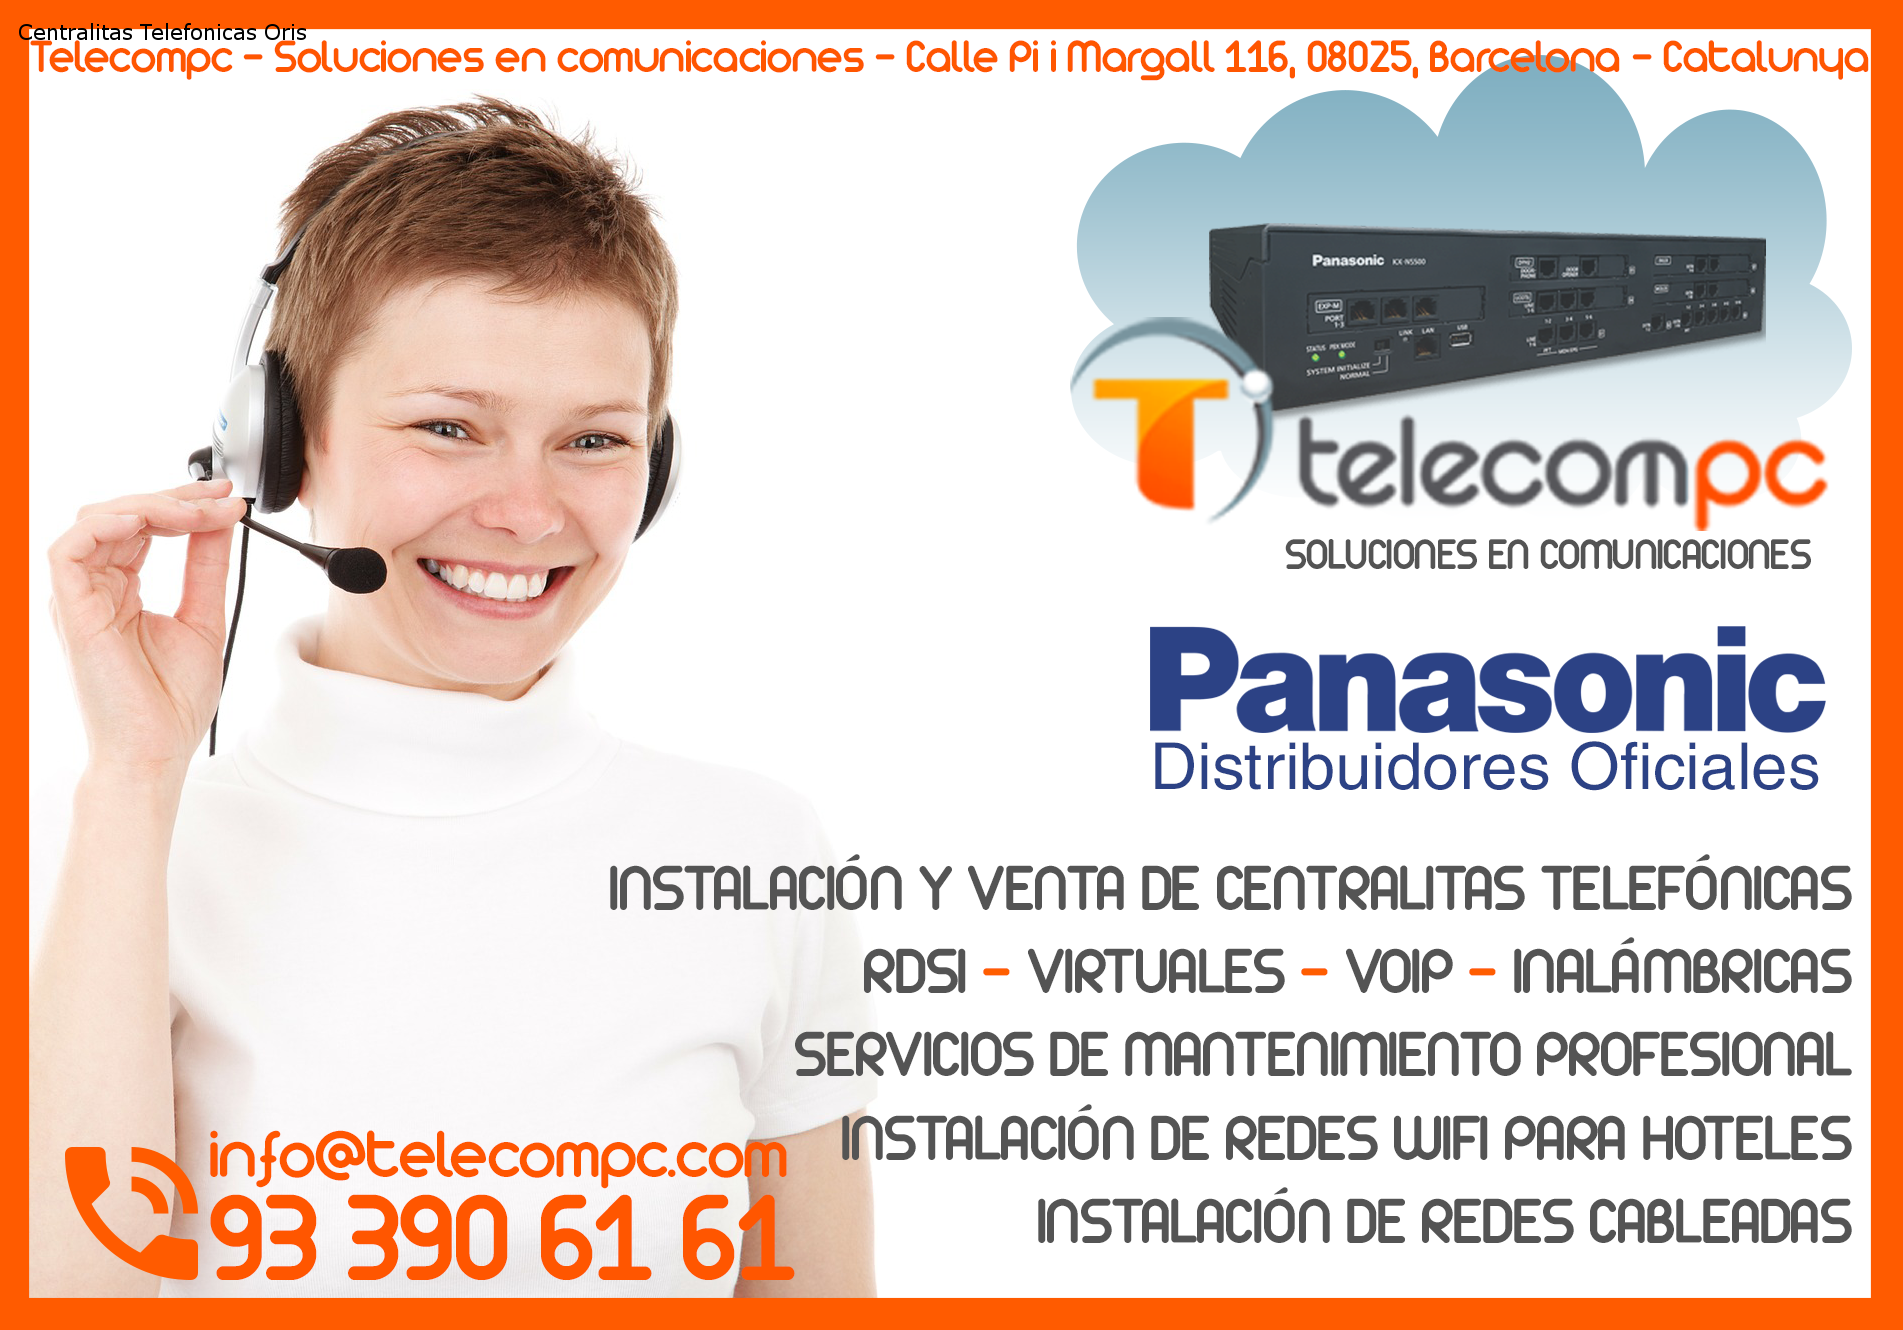 Centralitas Telefonicas Oris